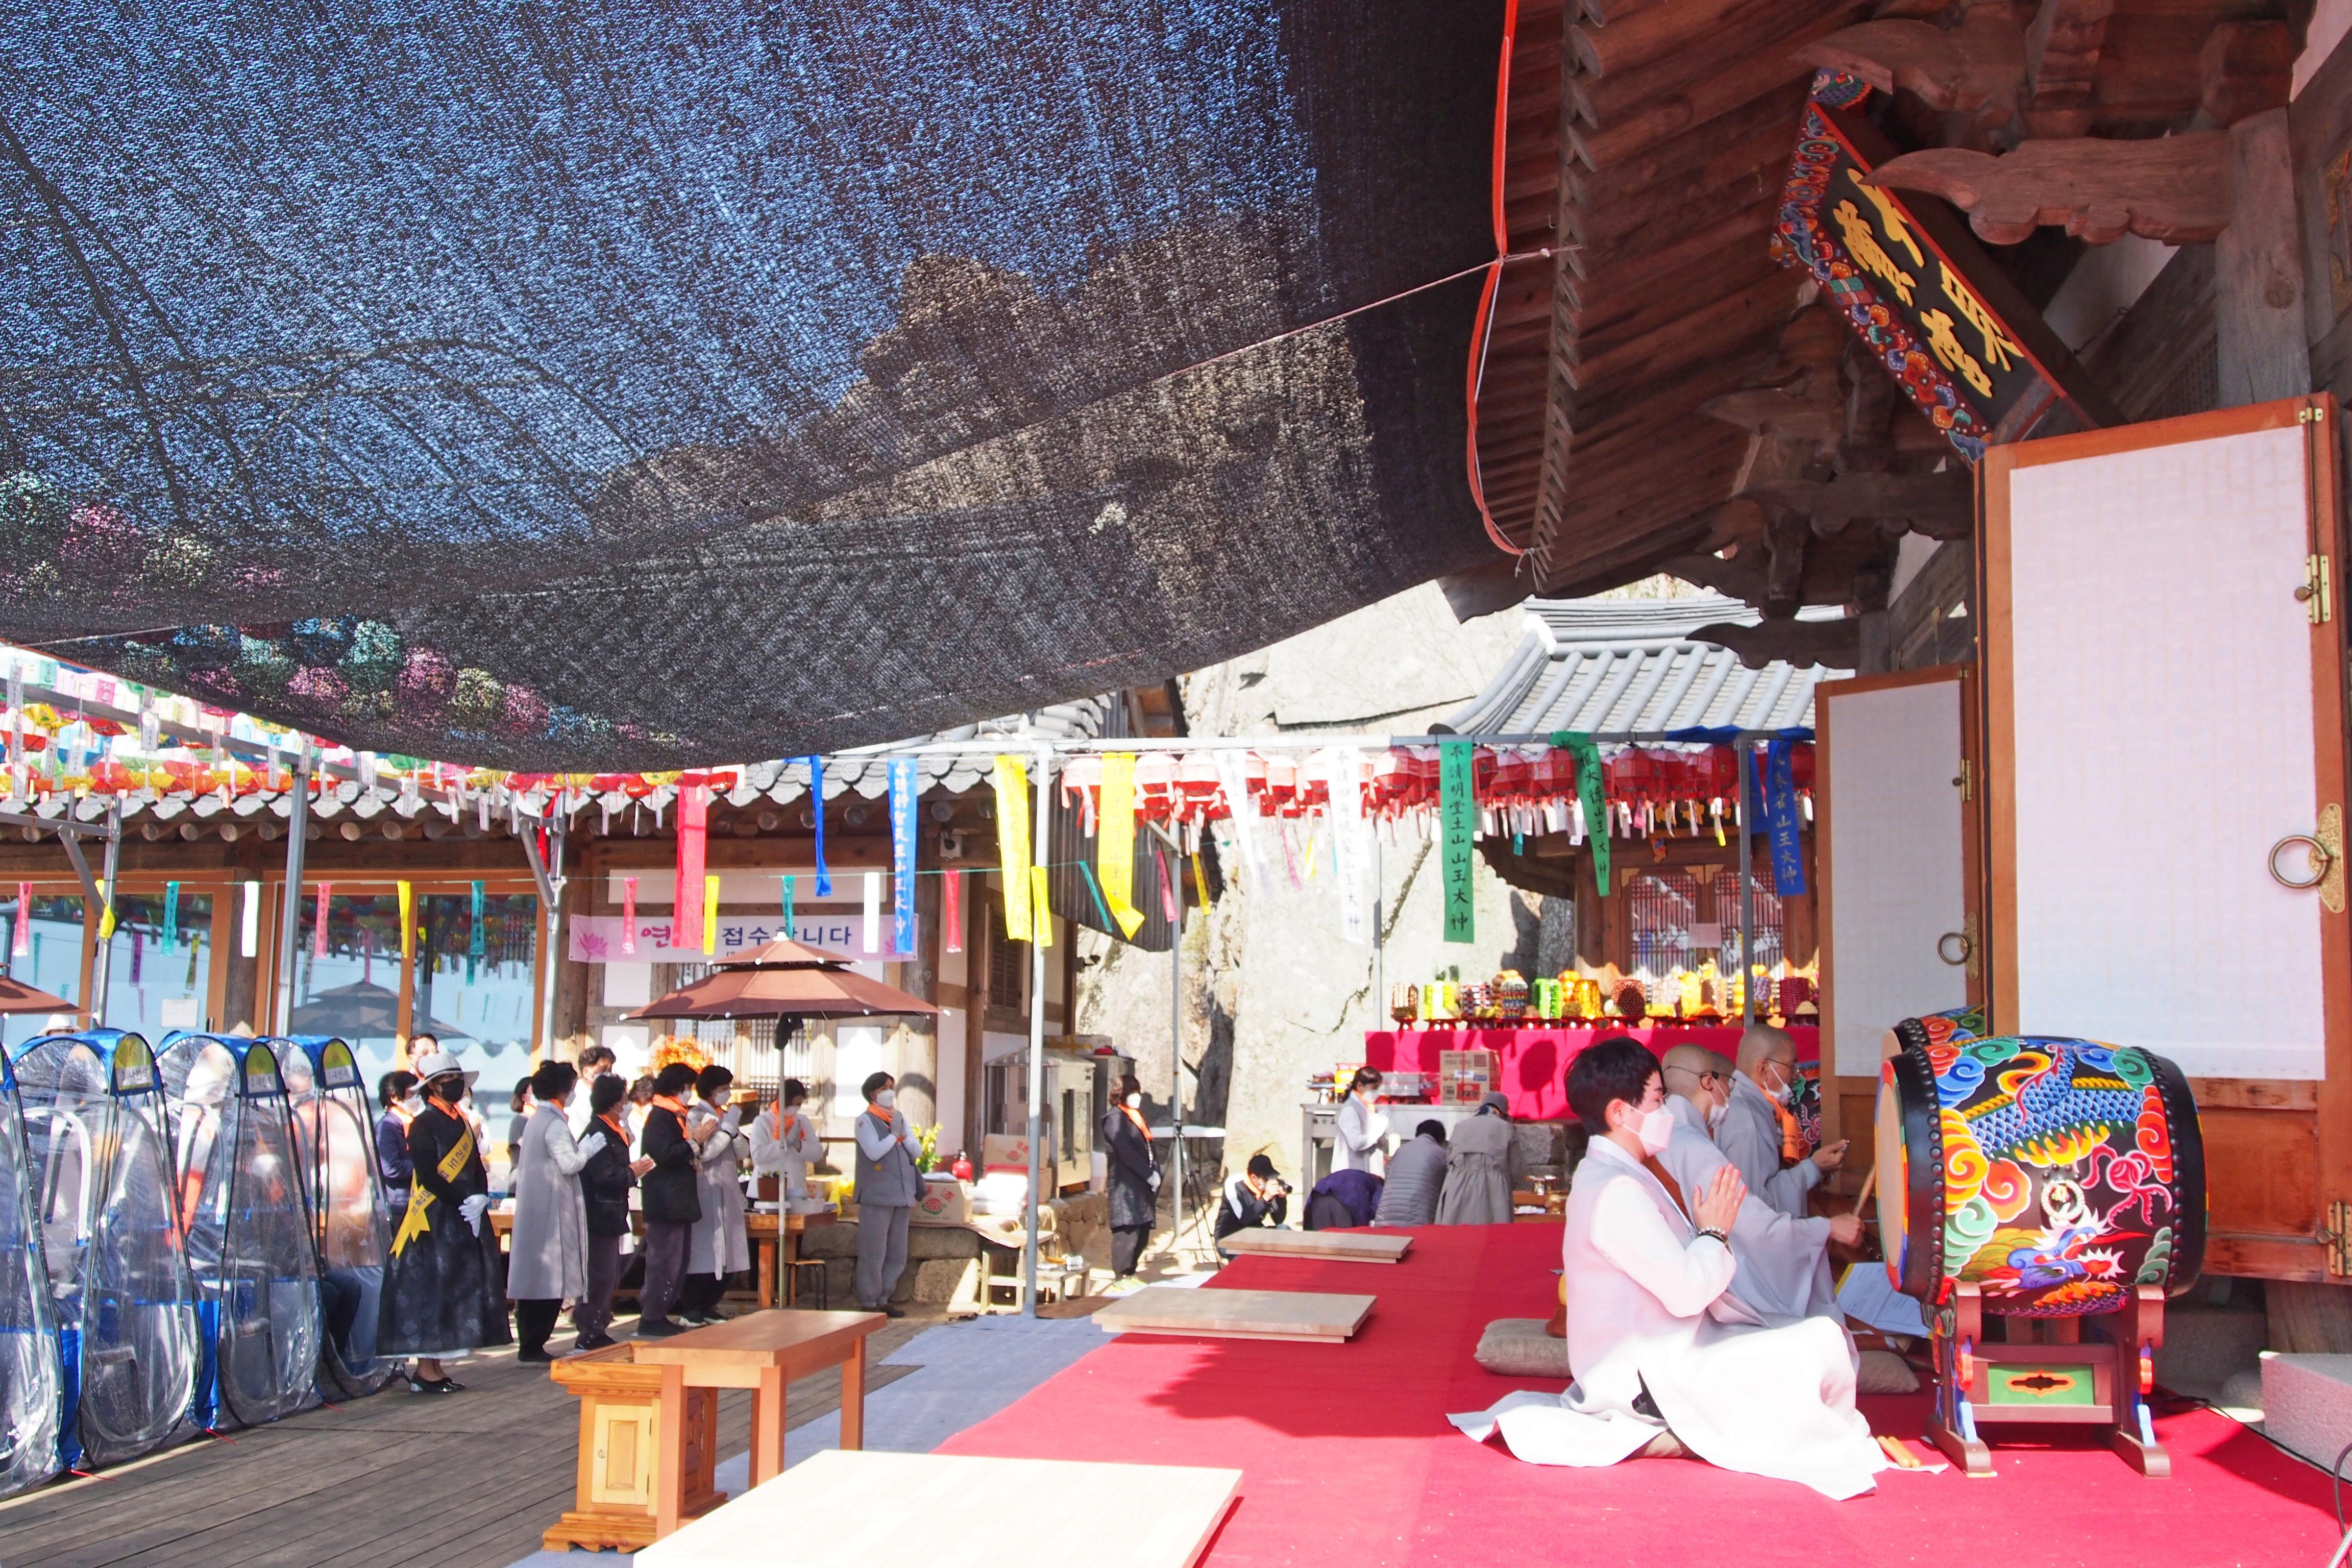 Prayer Pods Tent Buddhist temple South Korea COVID-19